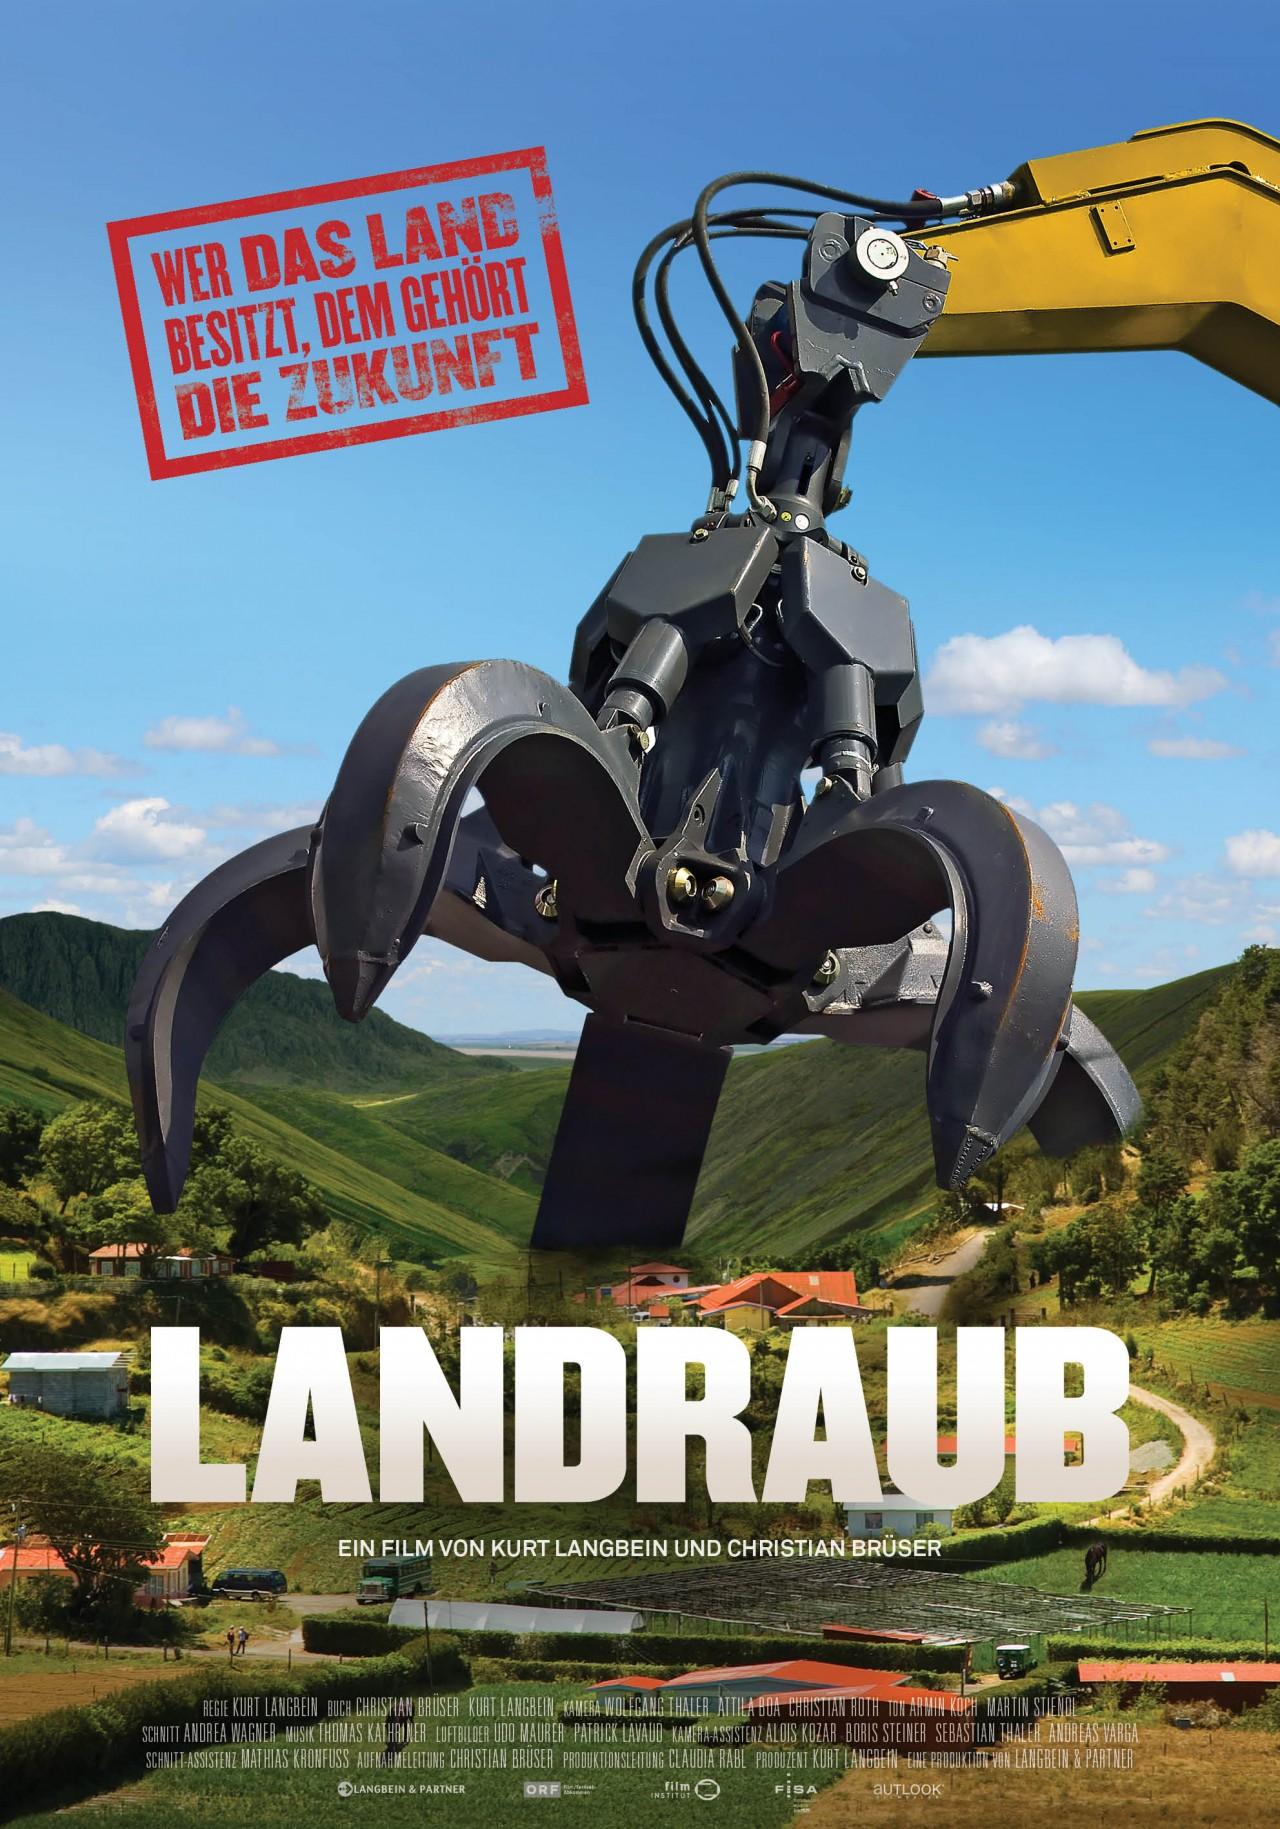 Filmplakat Landraub. Quelle: http://www.landraub.com